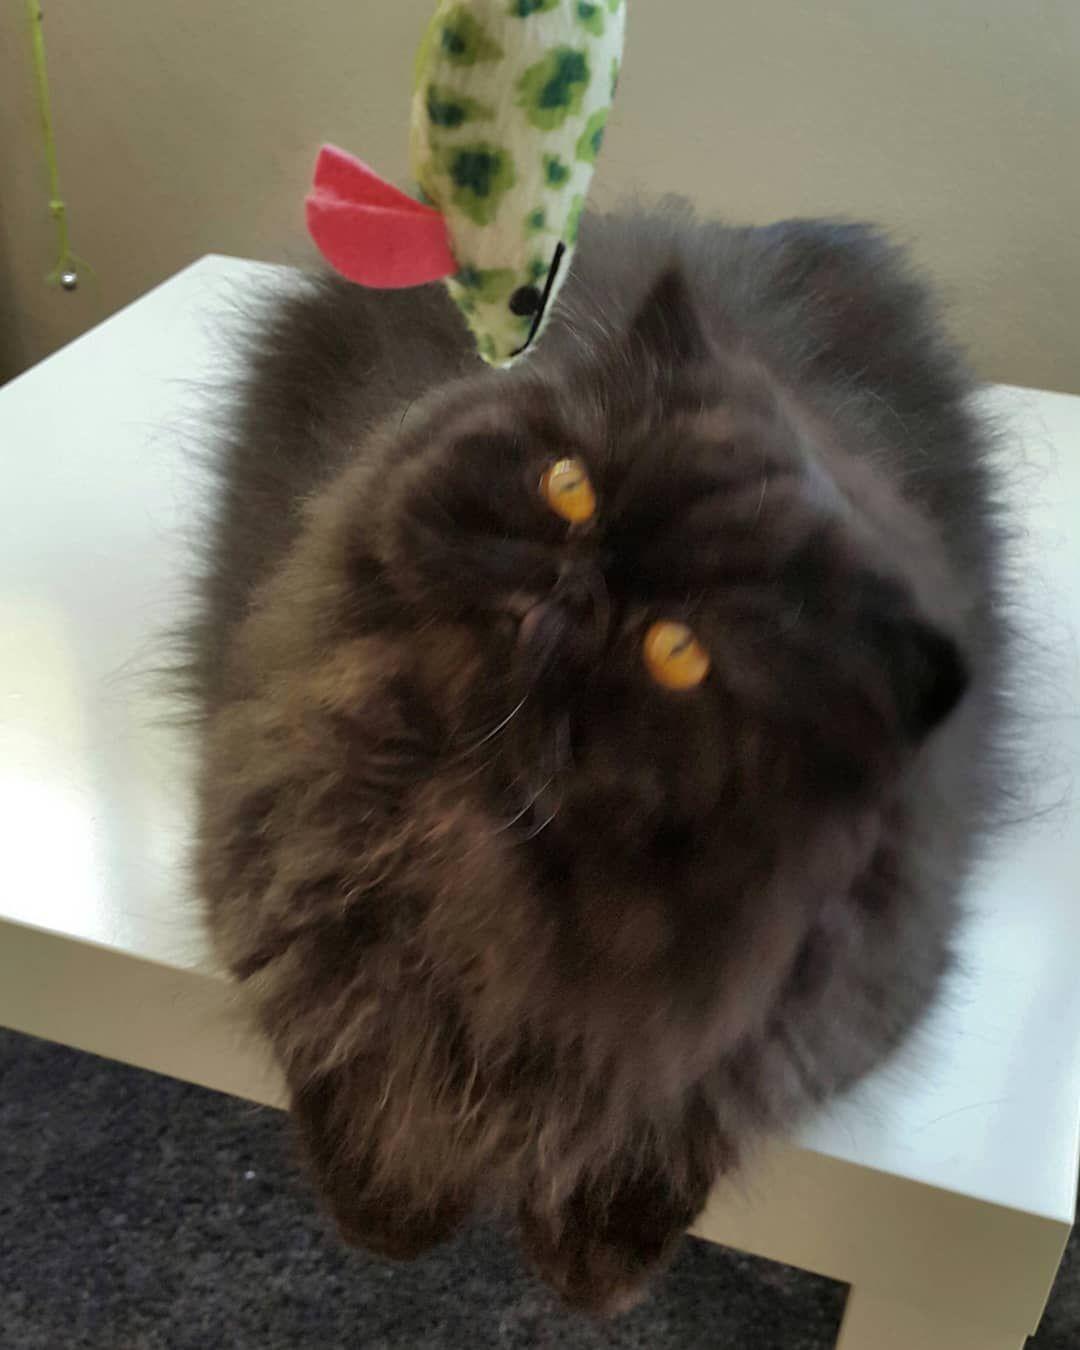 #ceazer #ceazeropersa #ceazerelpersa #cats #blackcat #bestcat #gatopersa #gato #gatoslindos #persa #persiancats #persian #persiancatlovers #catlovers #catsofig #meow #catstagram #instacat #ilovecats #ilovemycat #lovemycat #catlife #catslife #catofinsta #catofinstagram #dailycat #cutecat #happycatclub #lovelycats #catoftheday